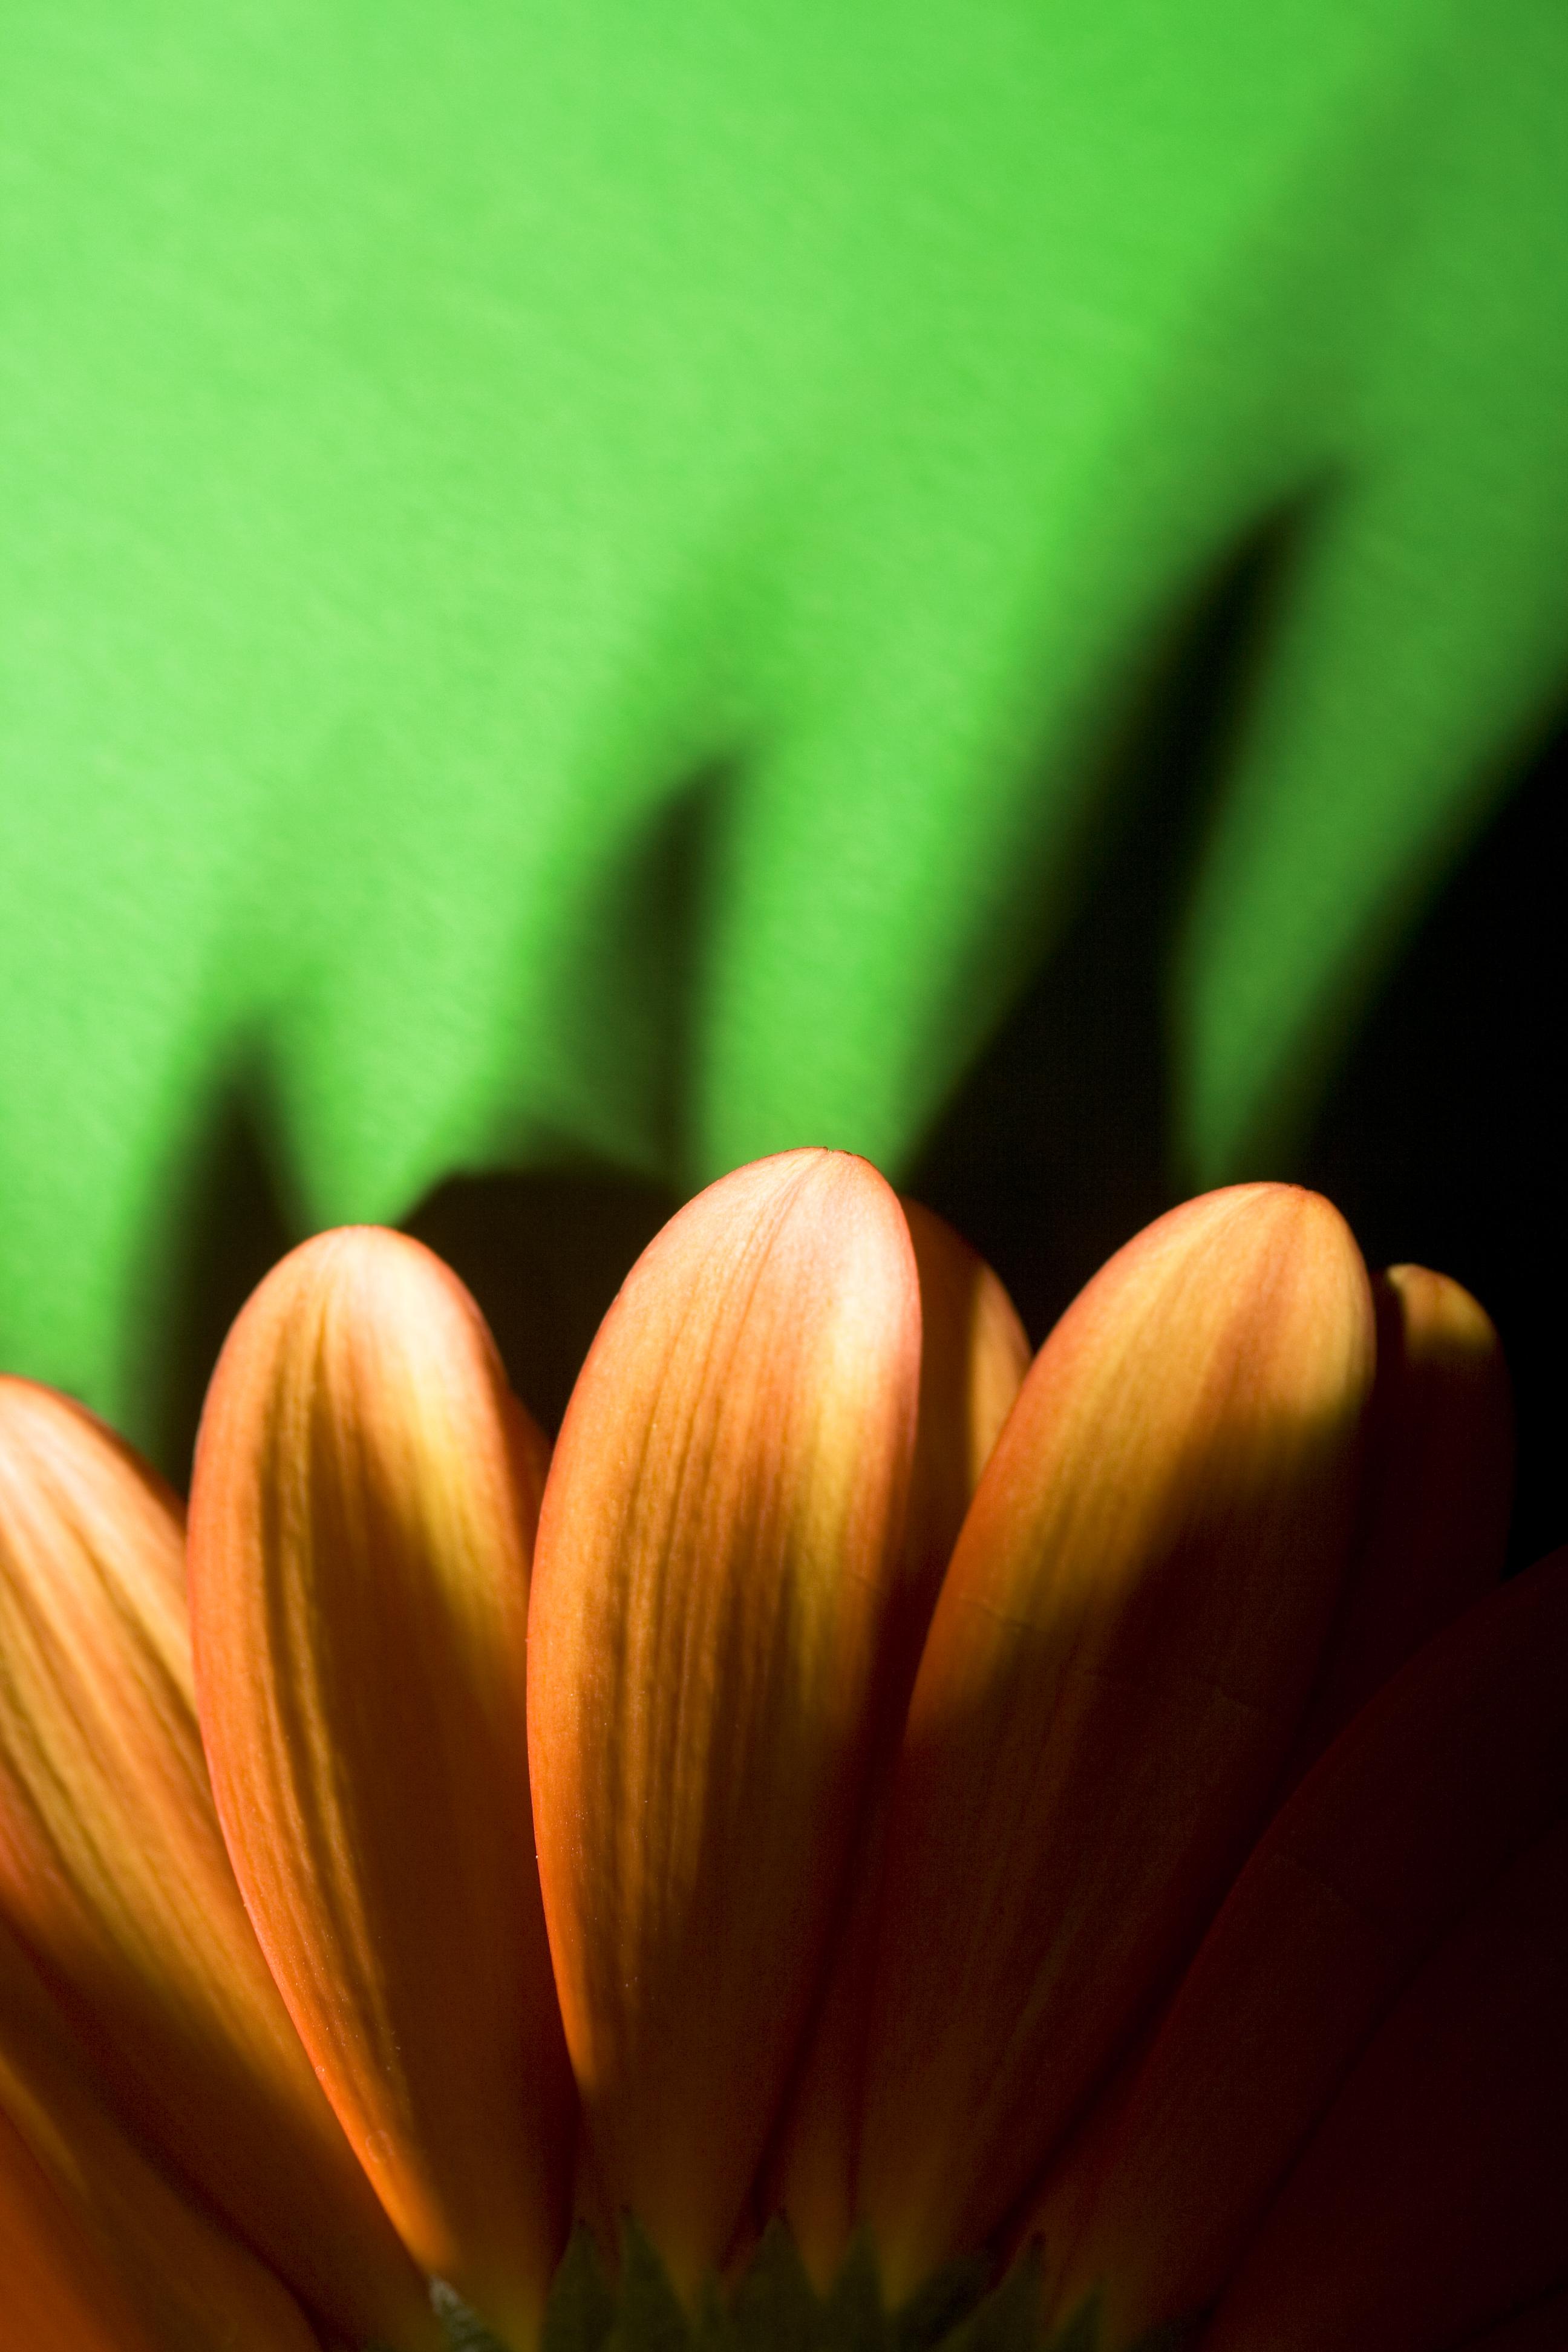 Flower Pedals, Summer, Studio, Spring, Pretty, HQ Photo